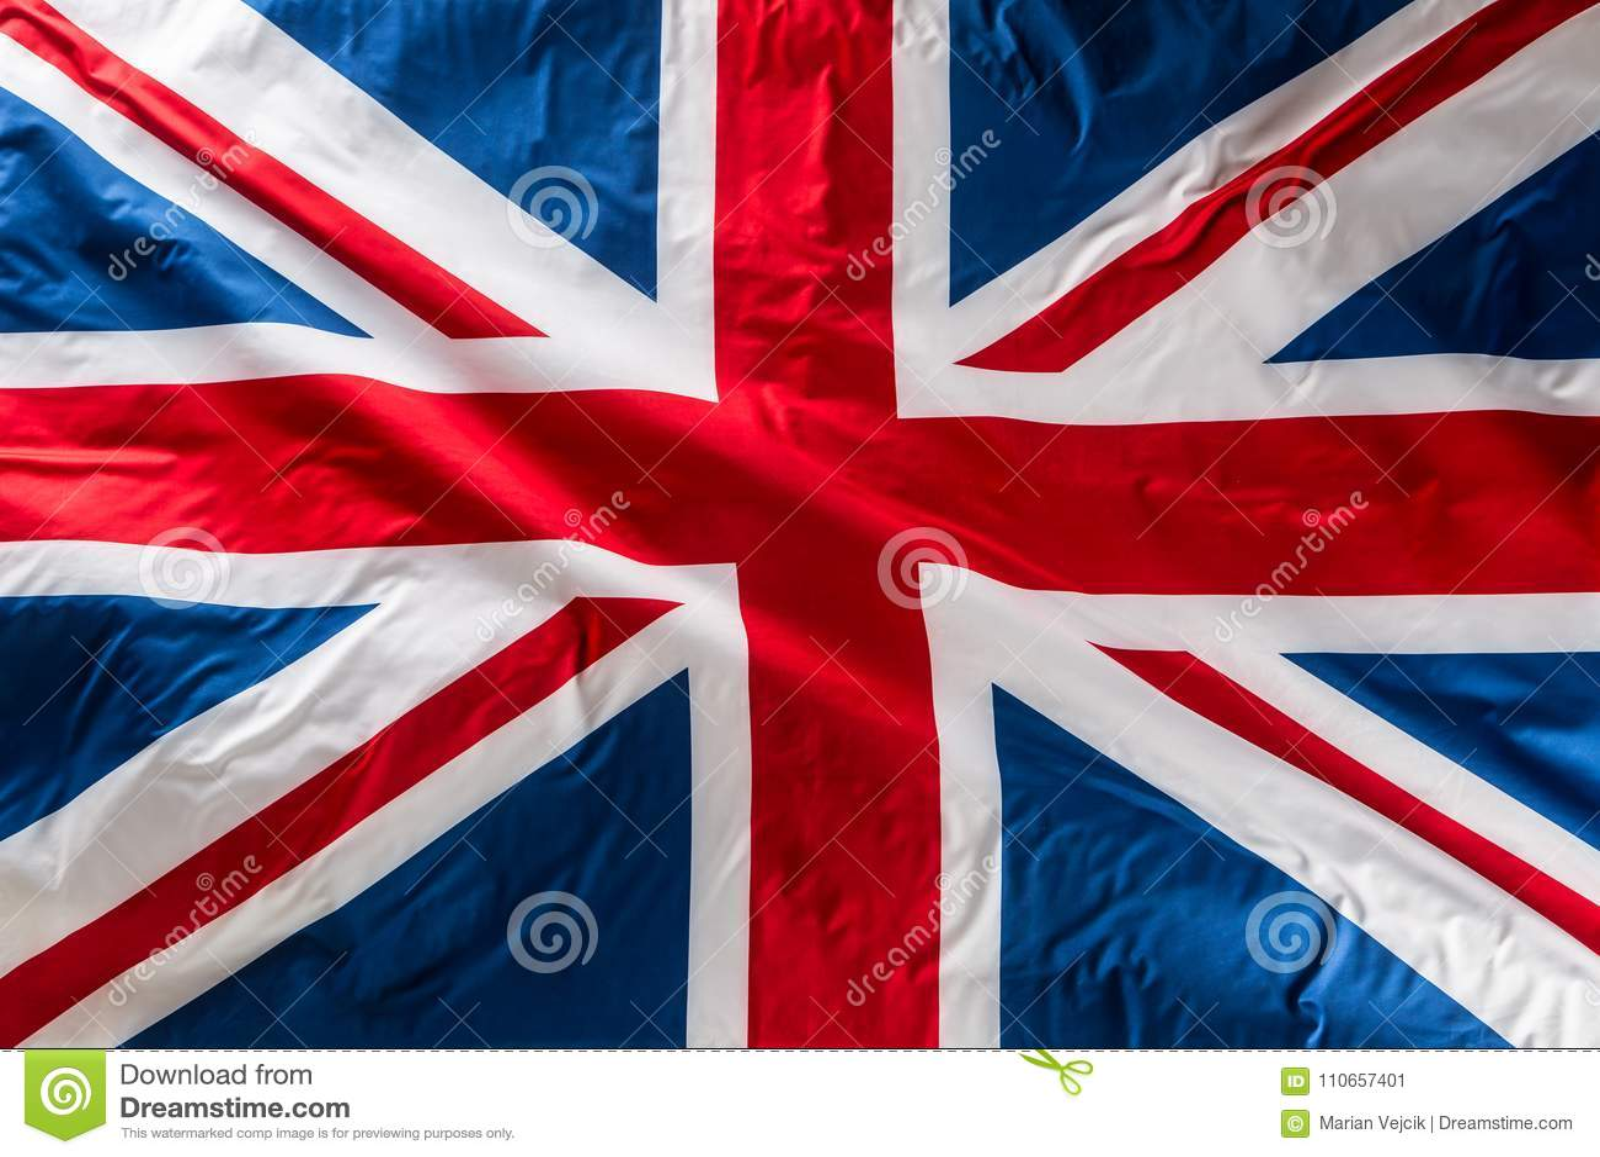 Closeup of Union Jack flag. UK Flag. British Union Jack flag blowing in the wind